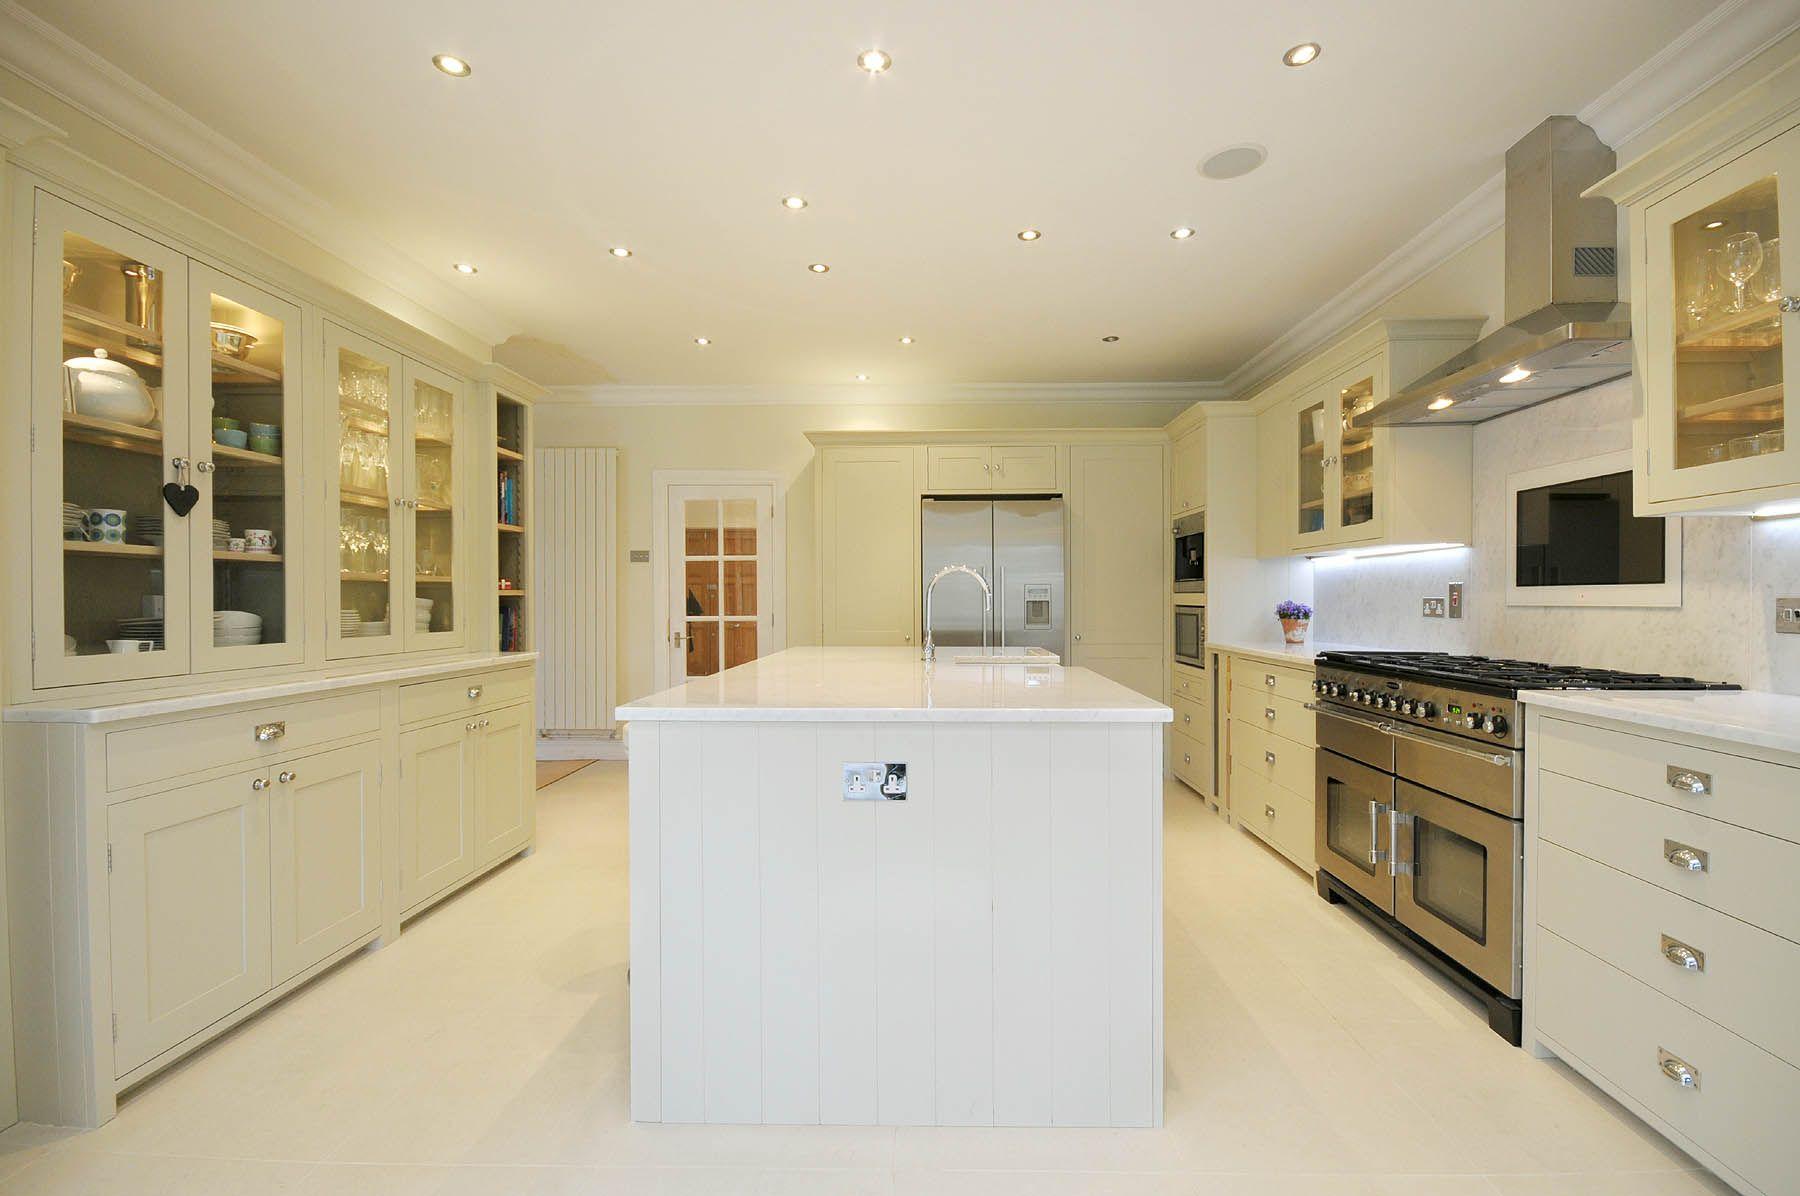 Neptune Kitchen Furniture Neptune Suffolk Kitchen In Dove Grey With Carrara Marble Tops